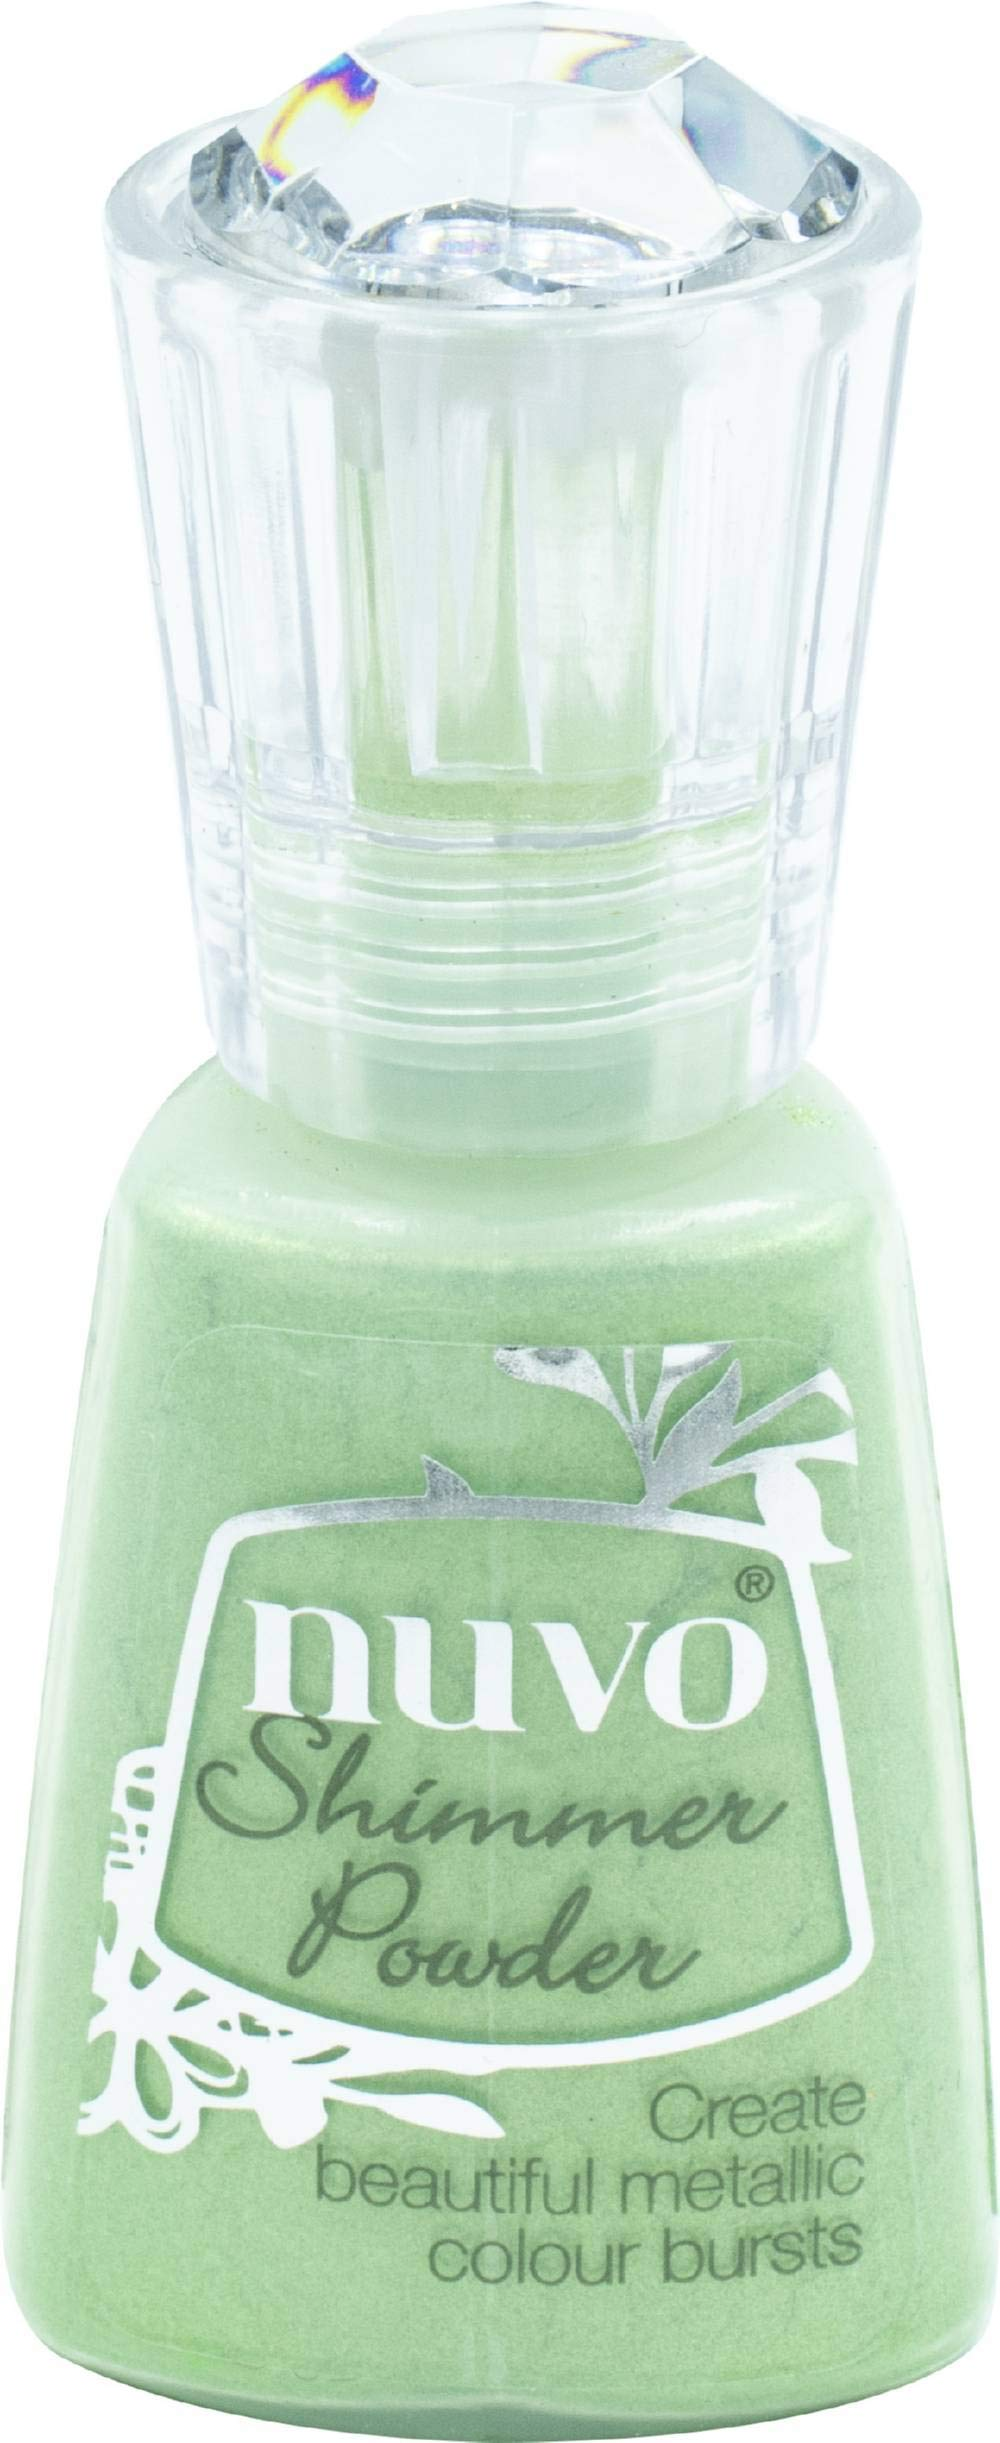 Tonic Studios NSP-1217 Nuvo Shimmer Powder-Falling Leaves by TONIC STUDIOS